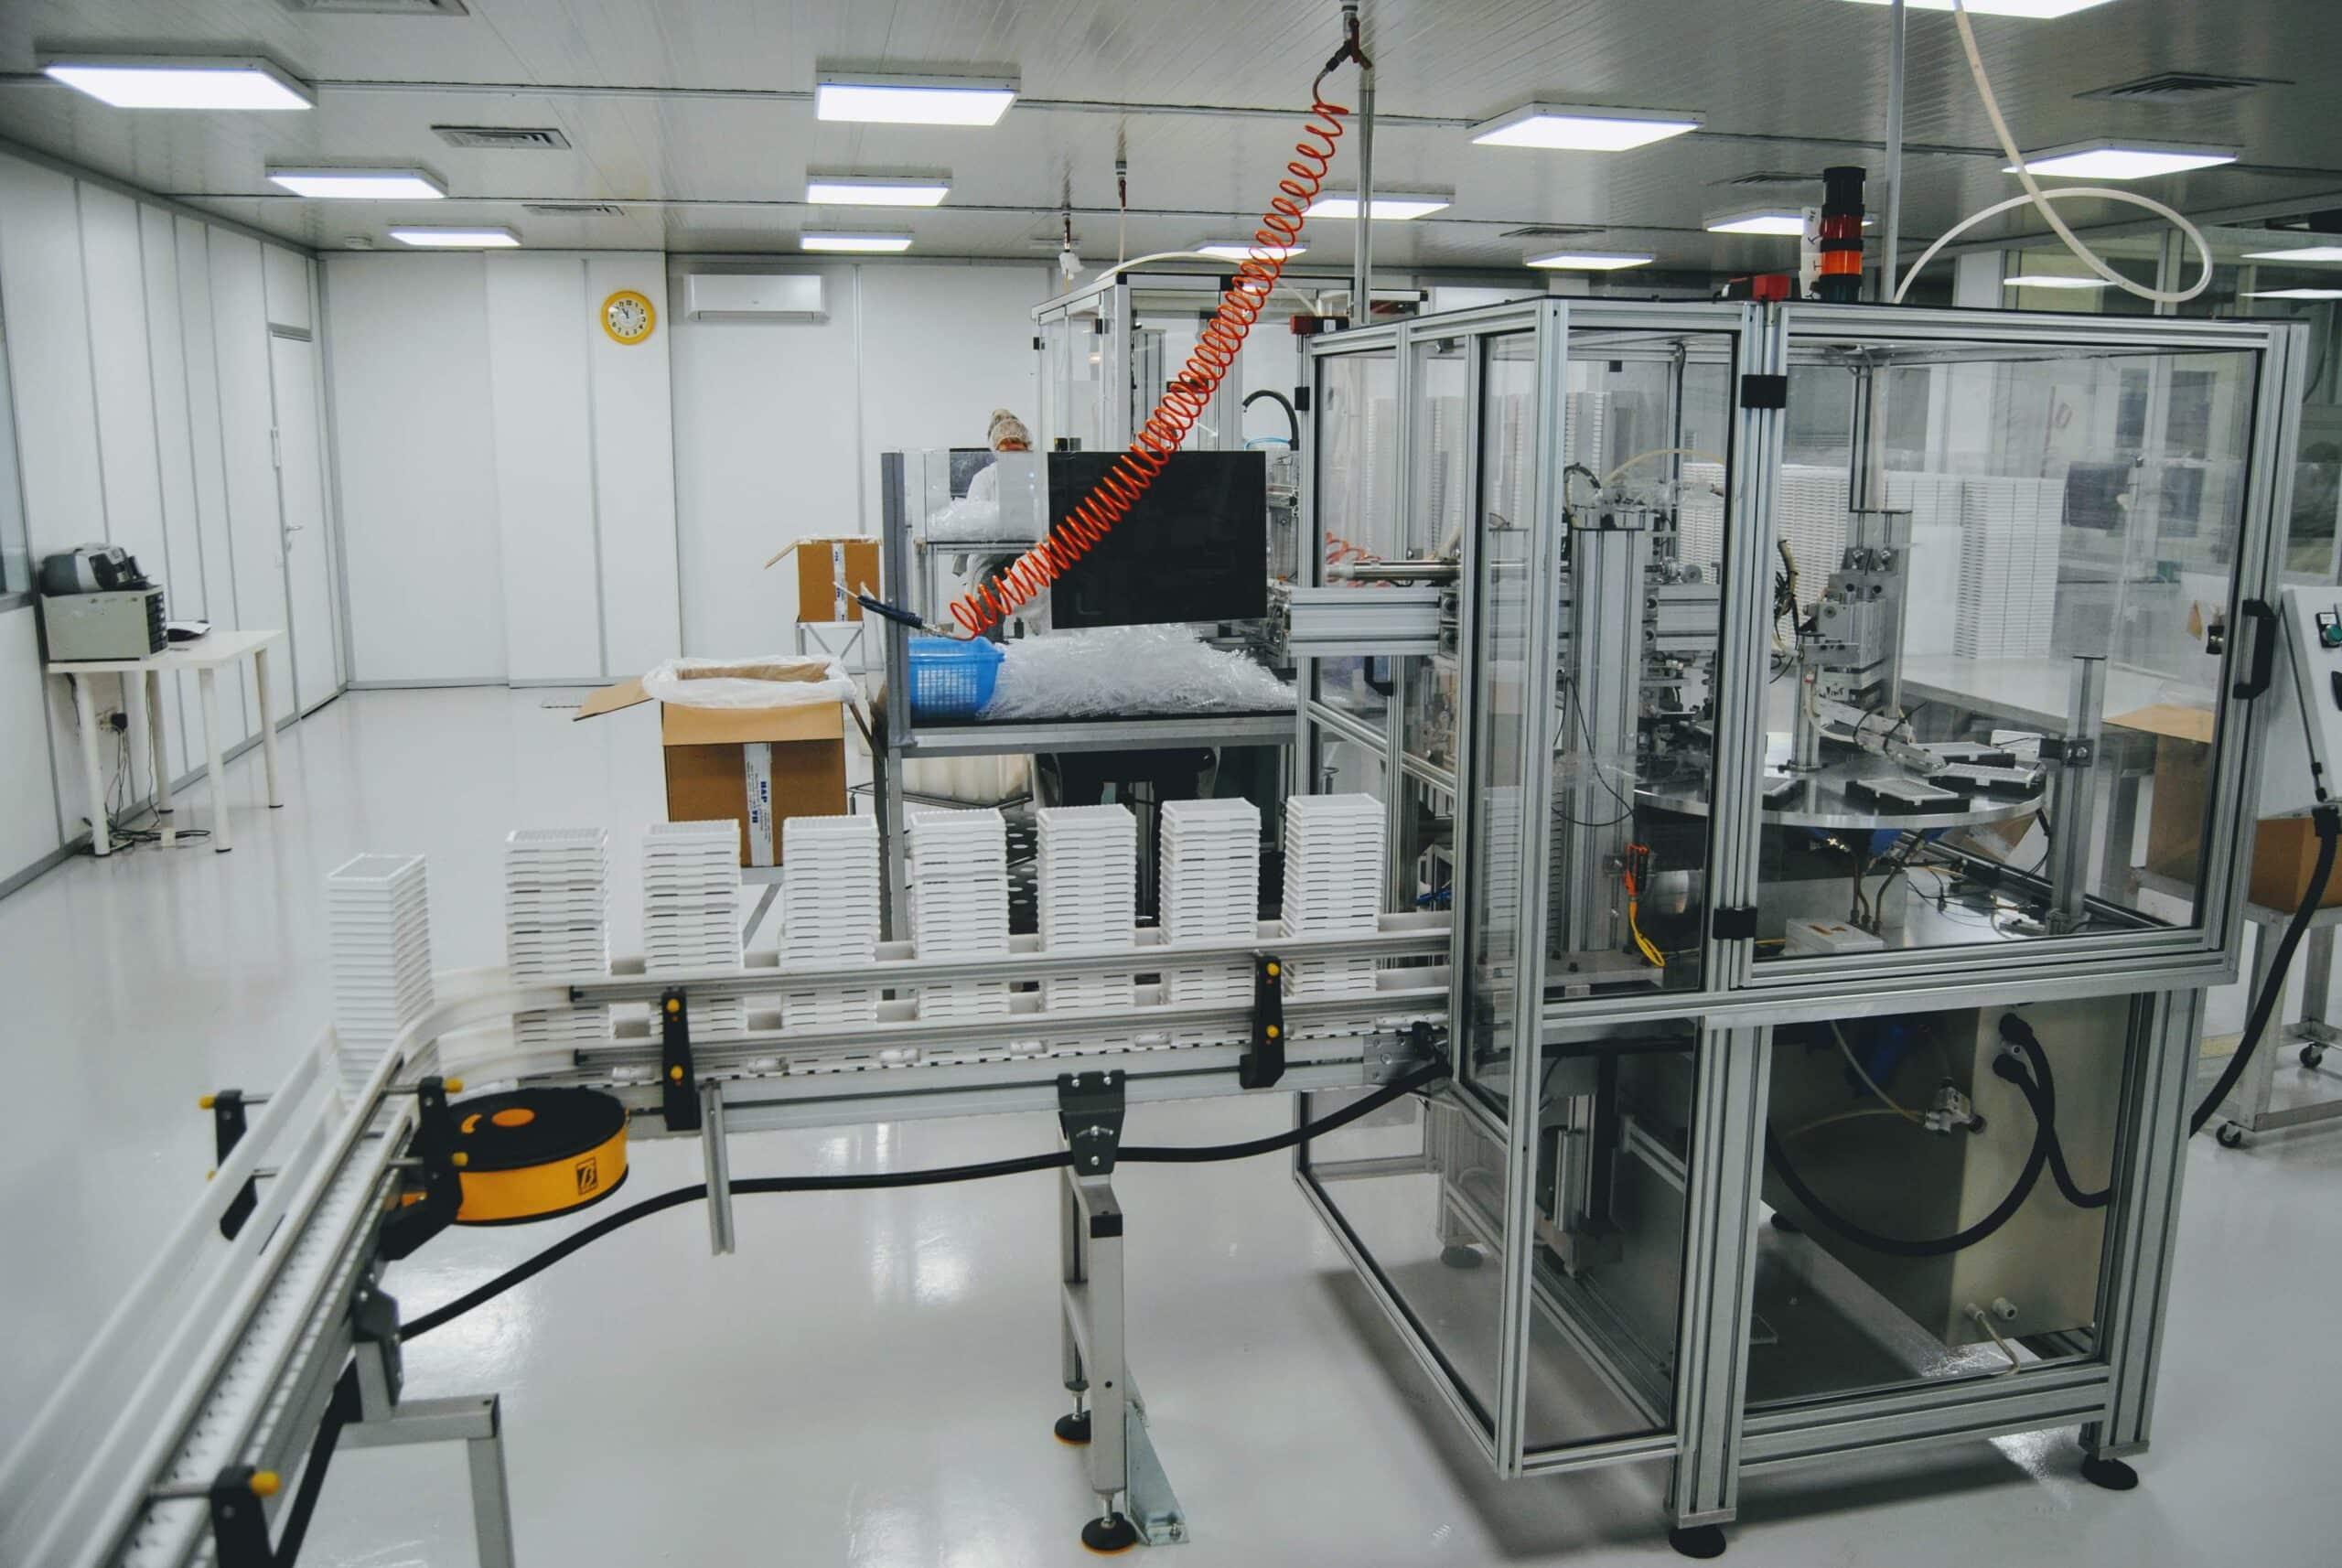 Biomat assembly line